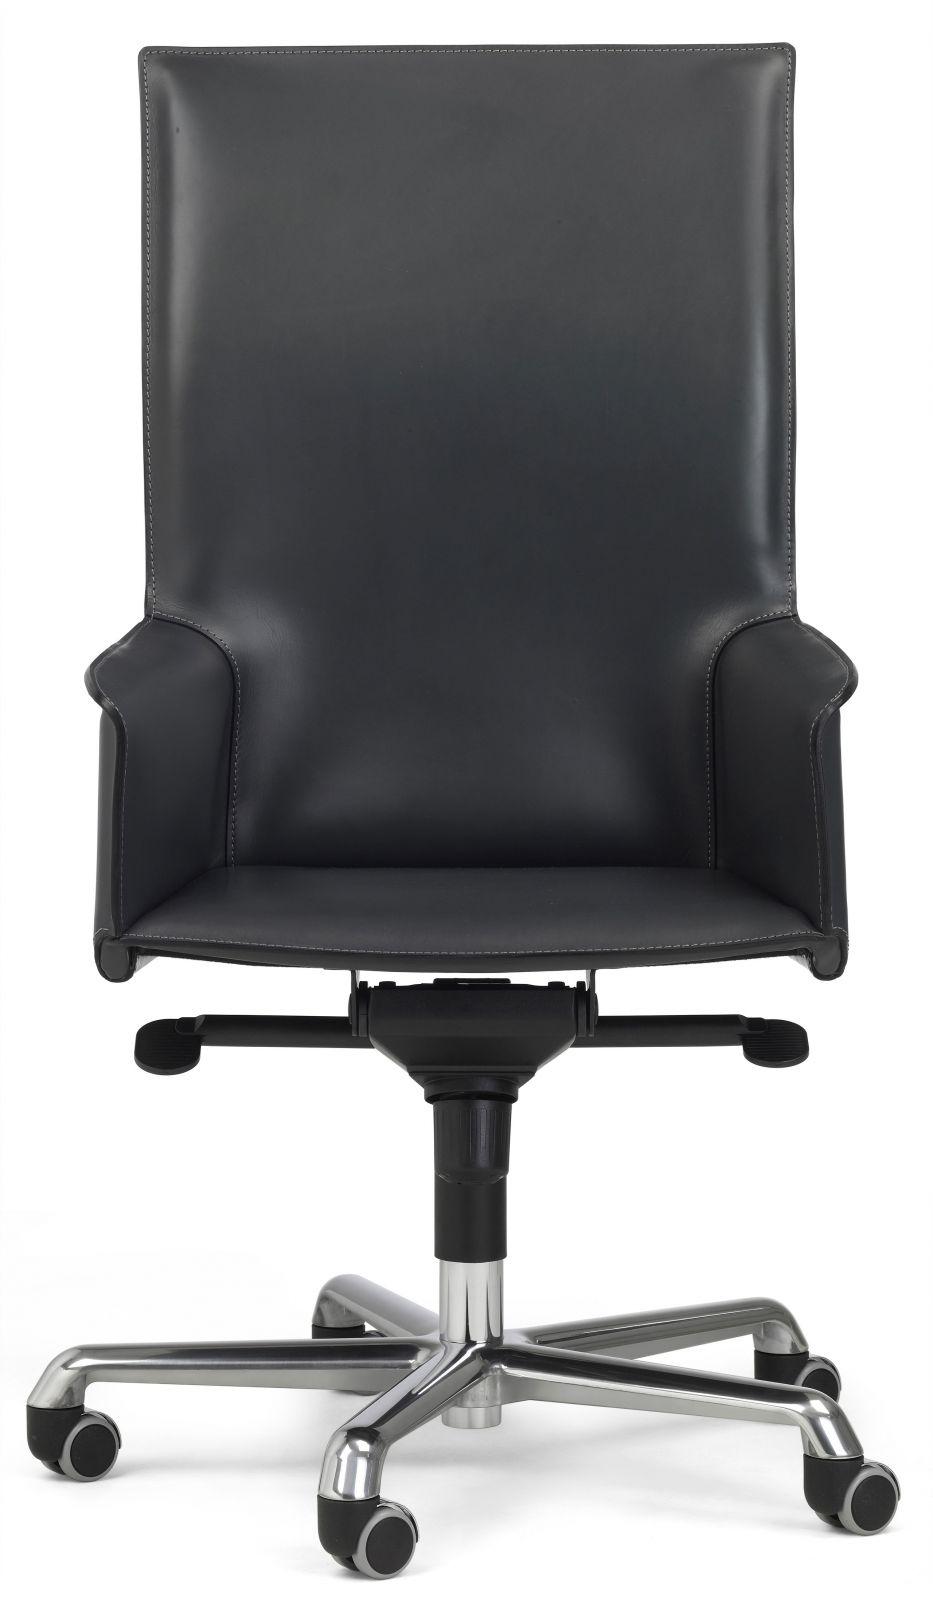 modern-office-chairs-Italian-furniture-designer-chairs (73).jpg